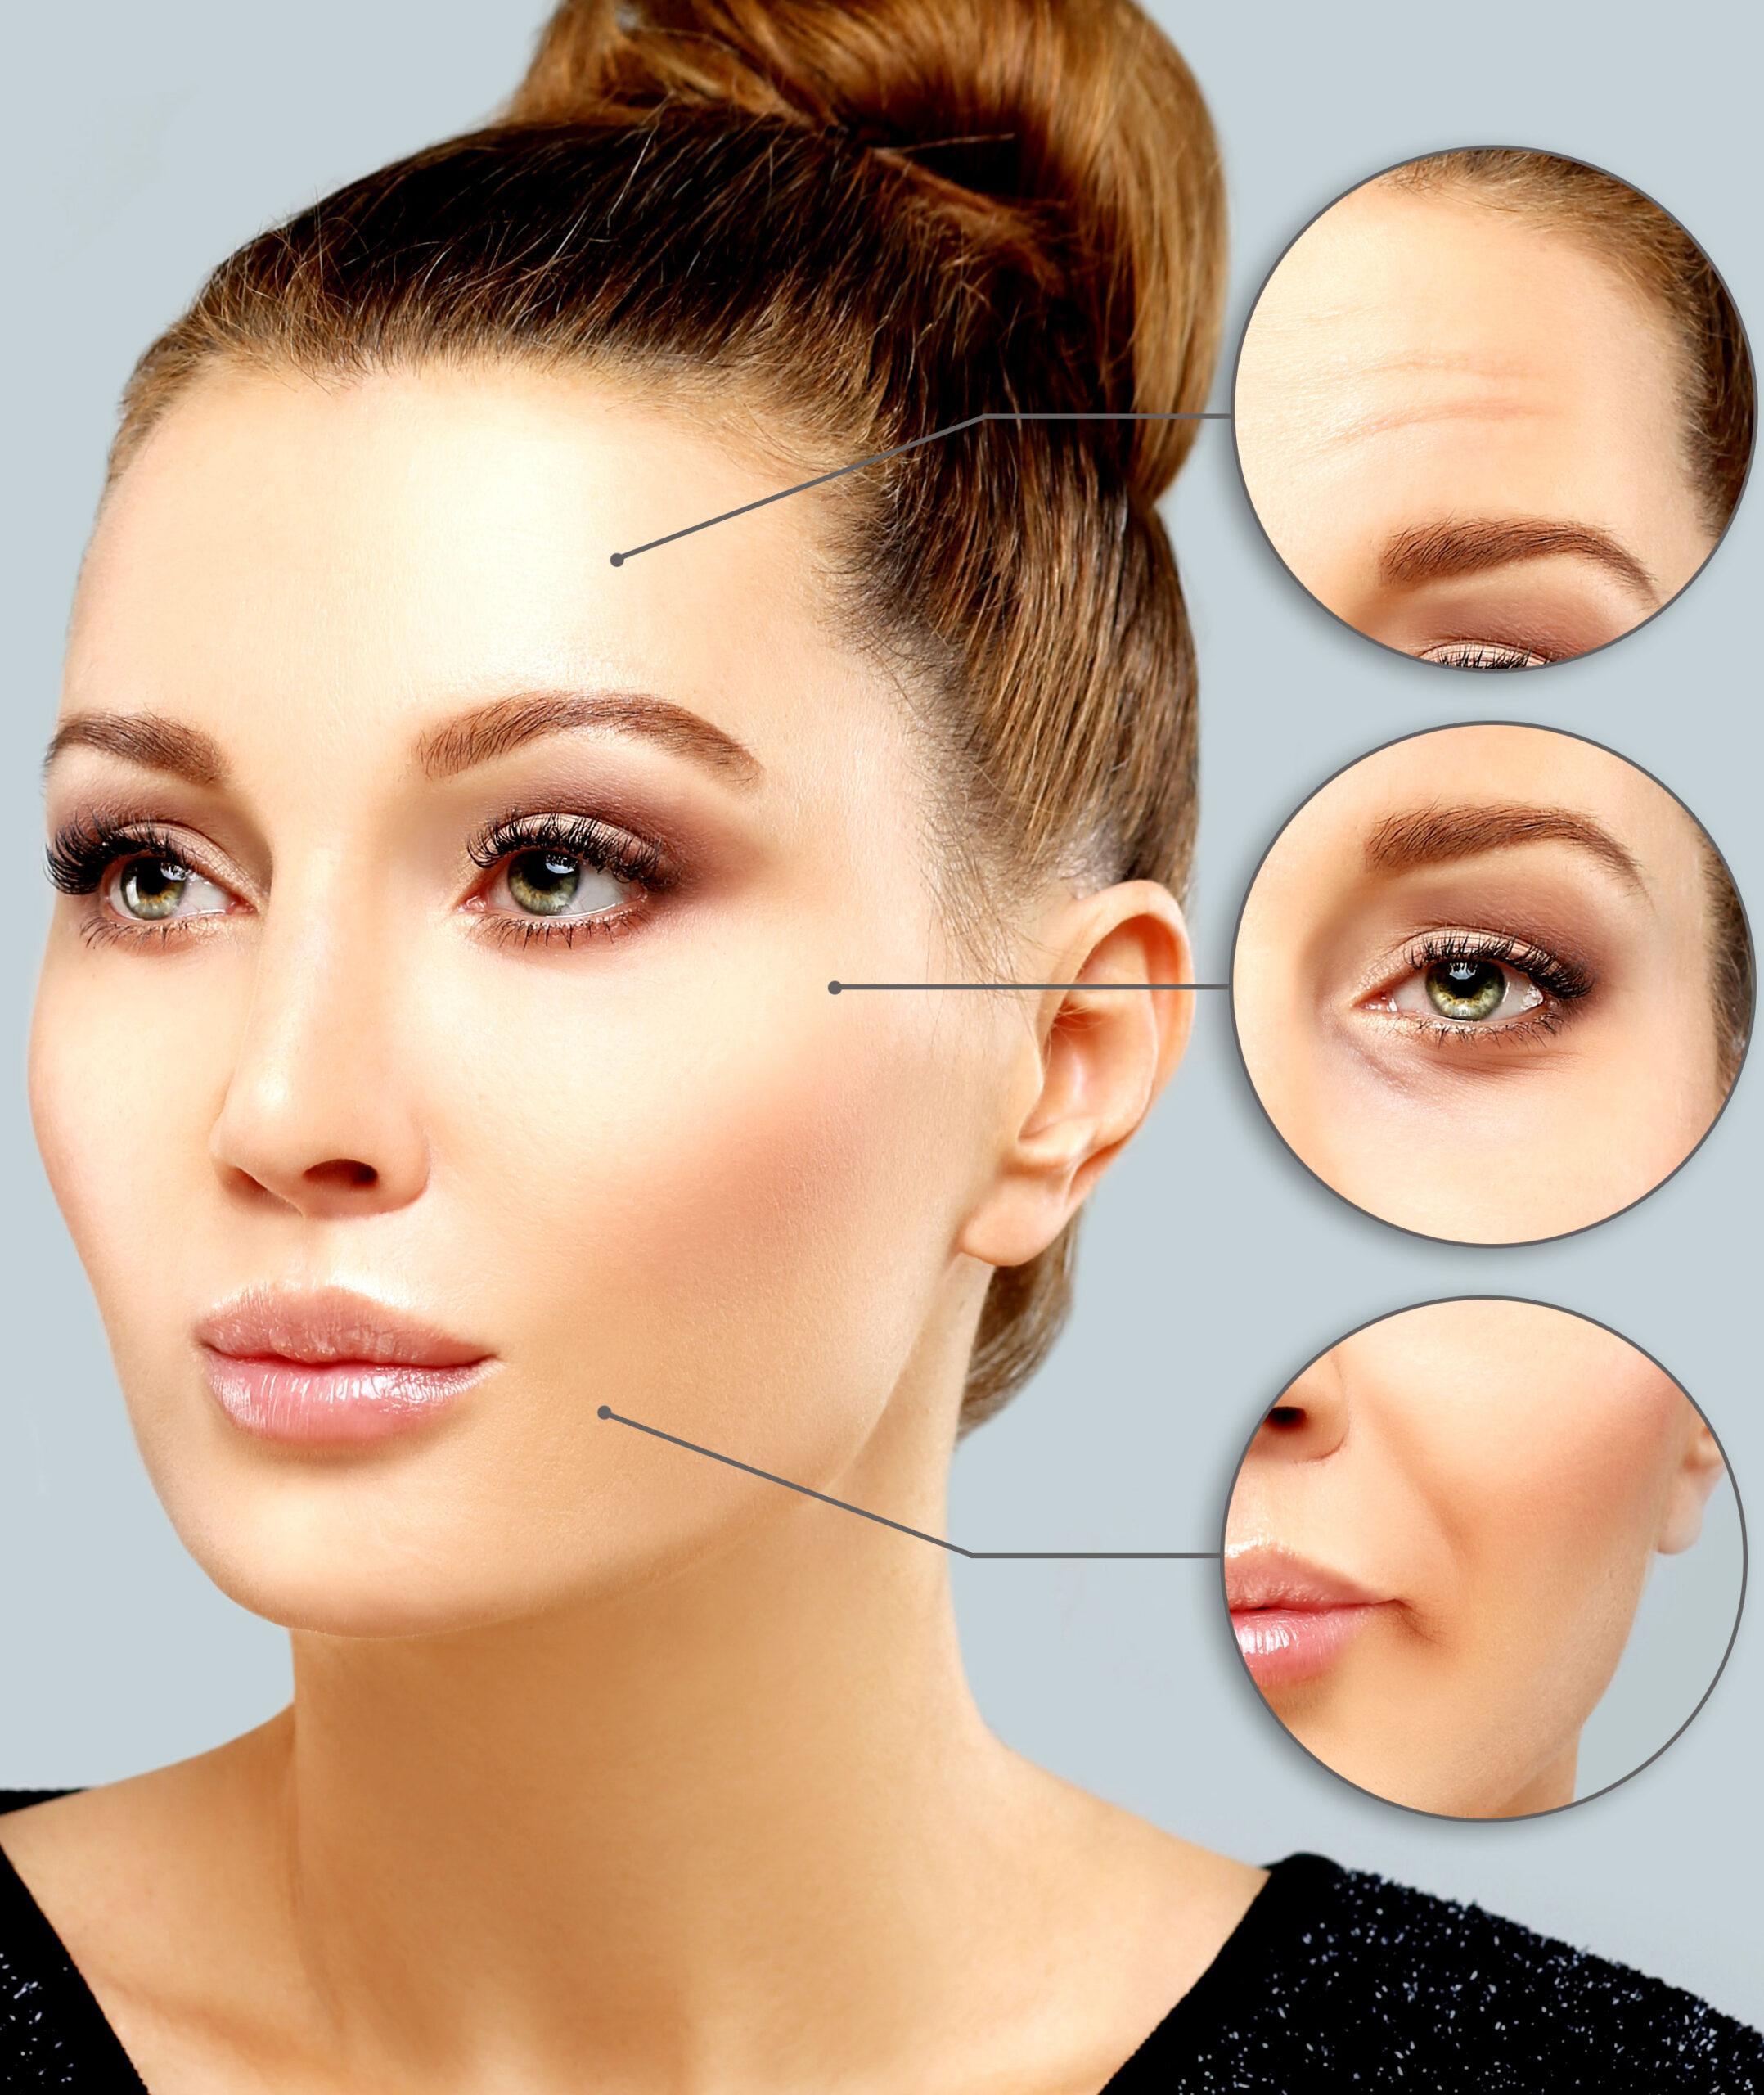 Skin Care & Medical Aesthetics